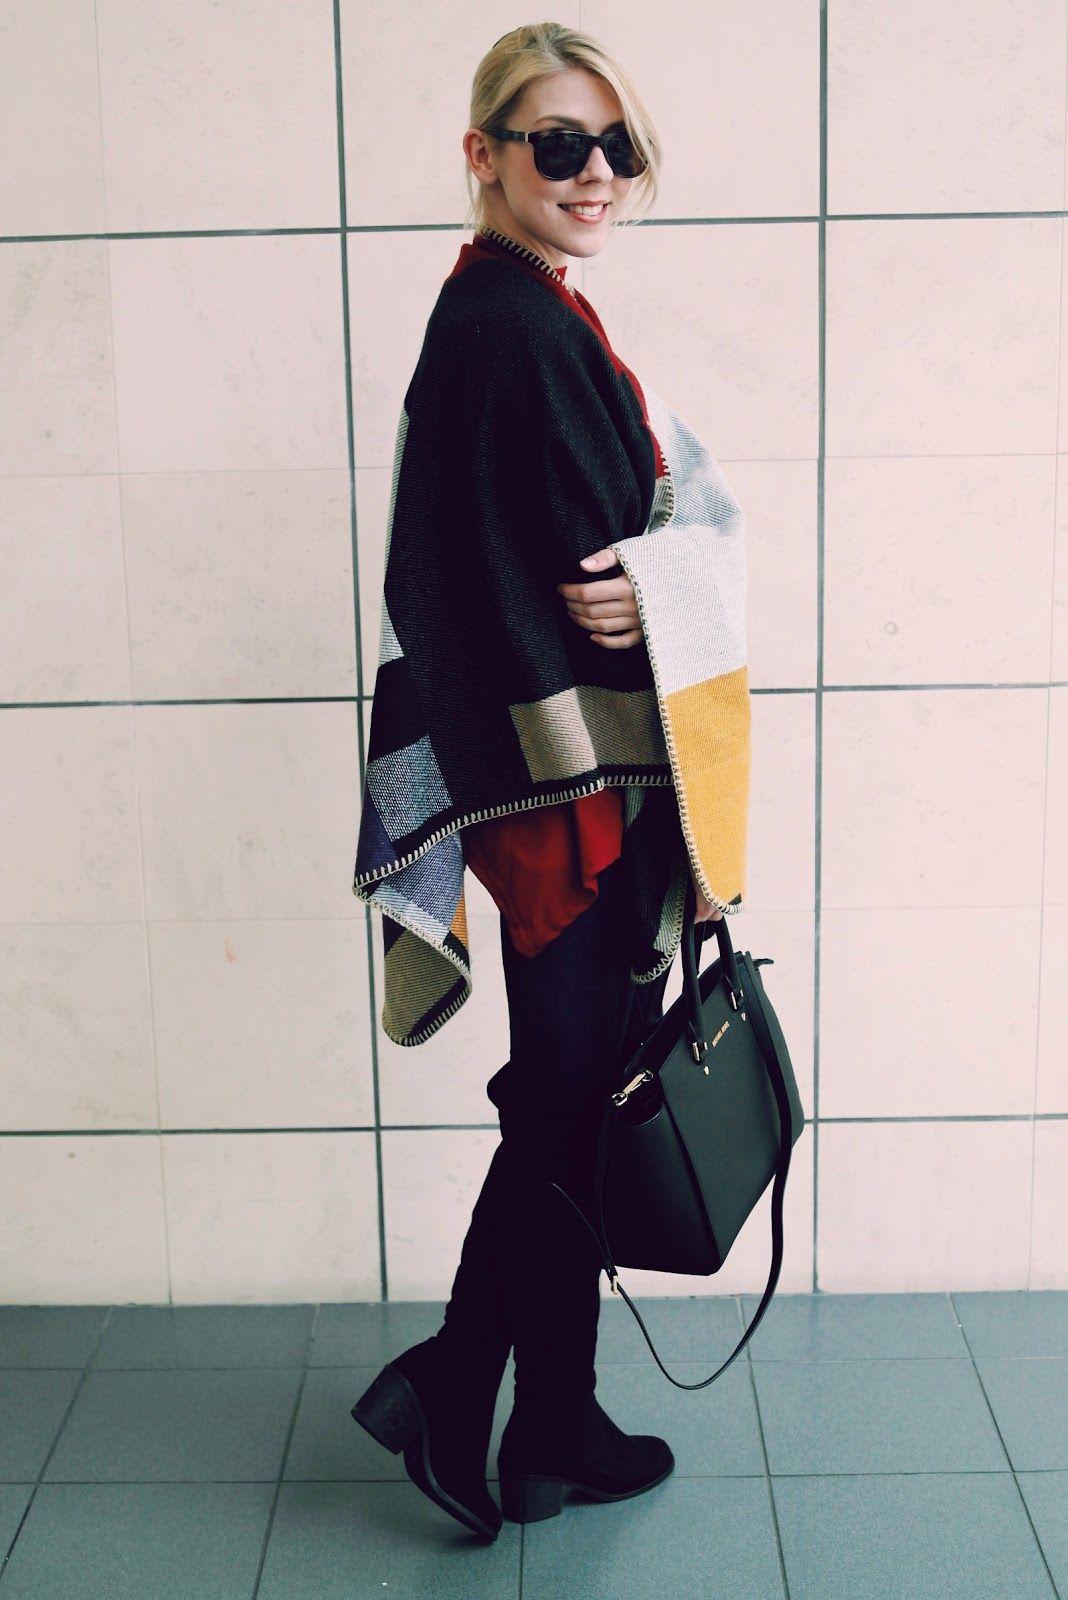 Classic Check Poncho | The Kawaii Planet : Kawaii Fashion Blog